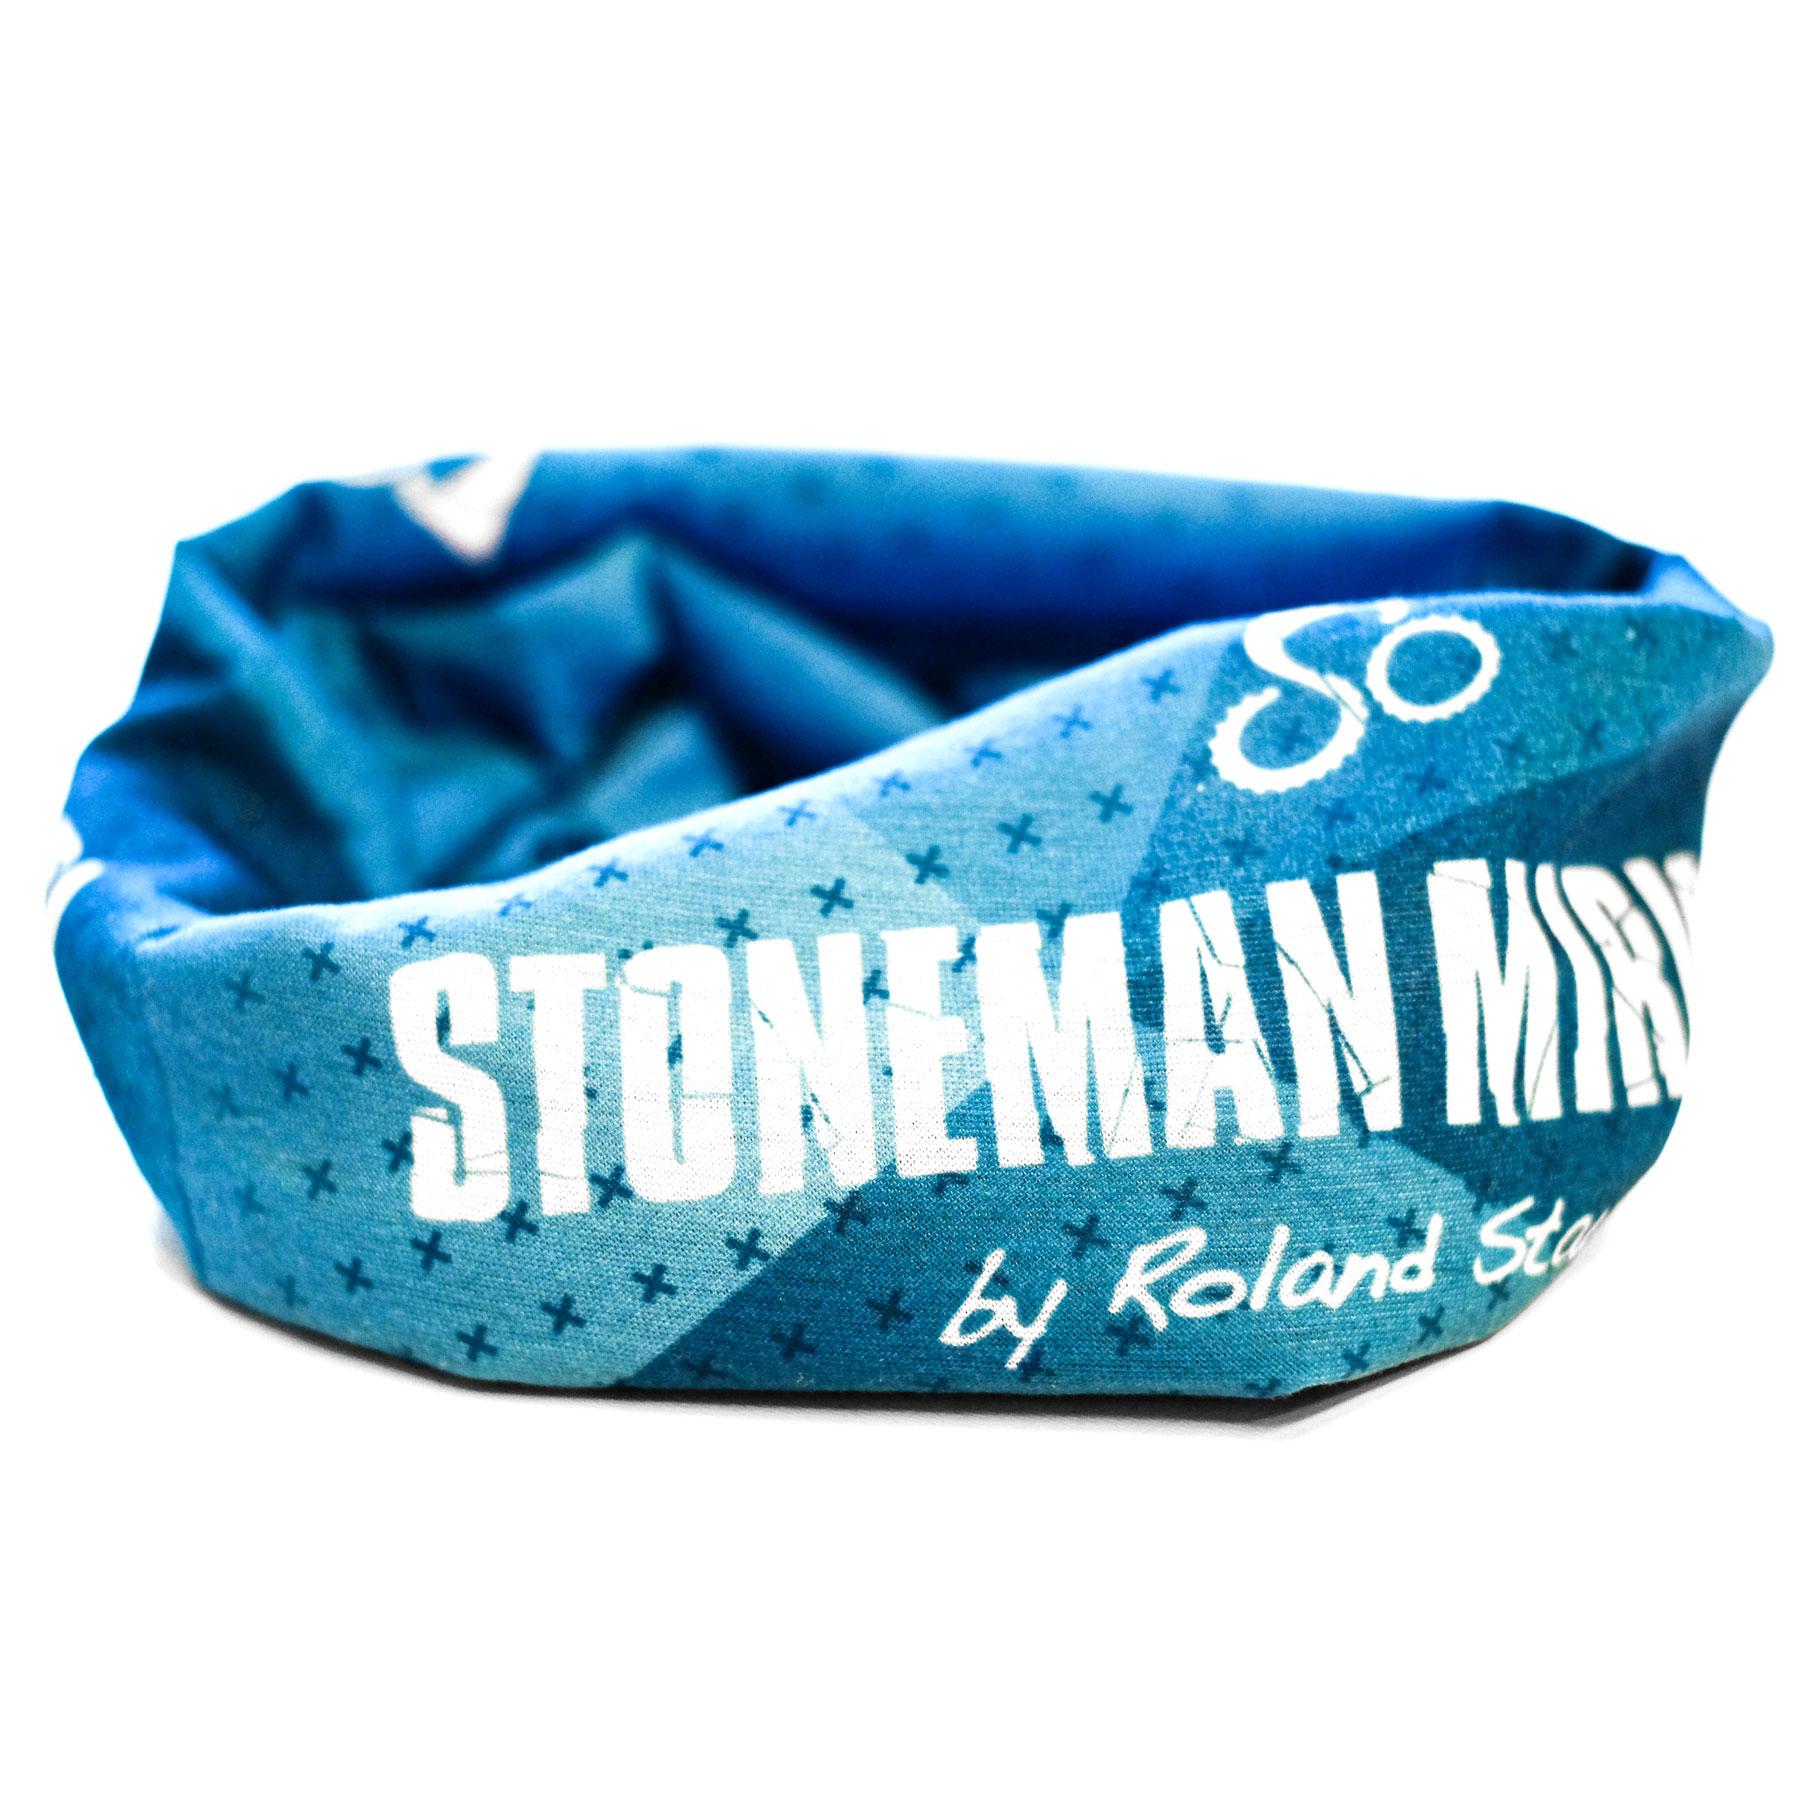 Stoneman Hero Multifunktionstuch - Miriquidi